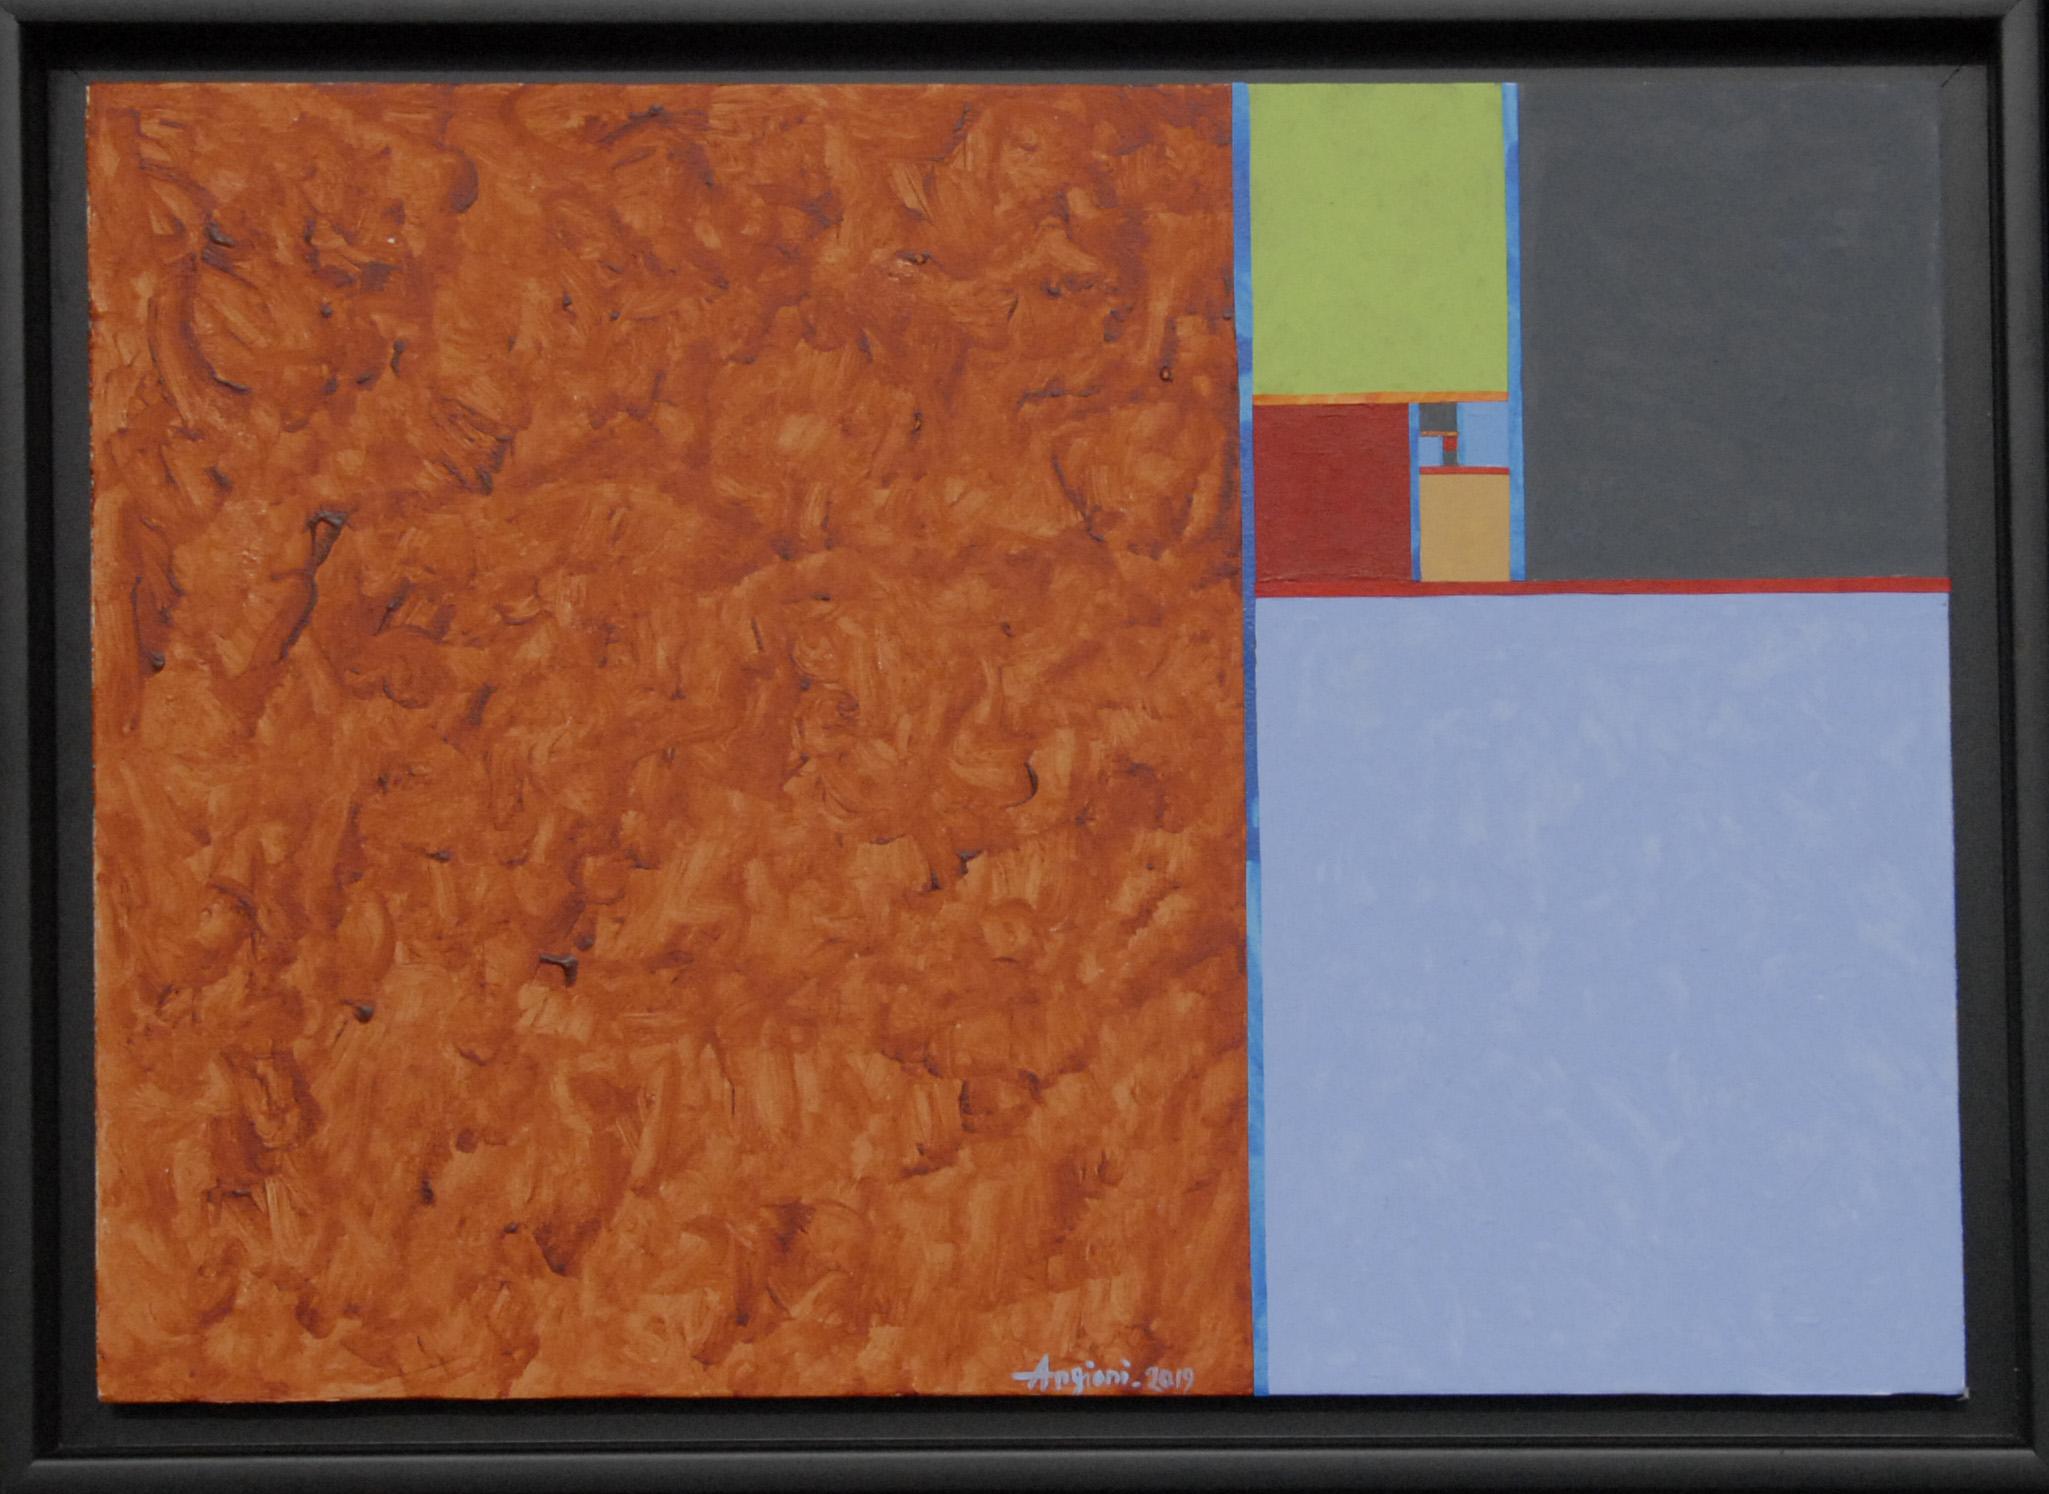 sezione aurea #3, cm48x33